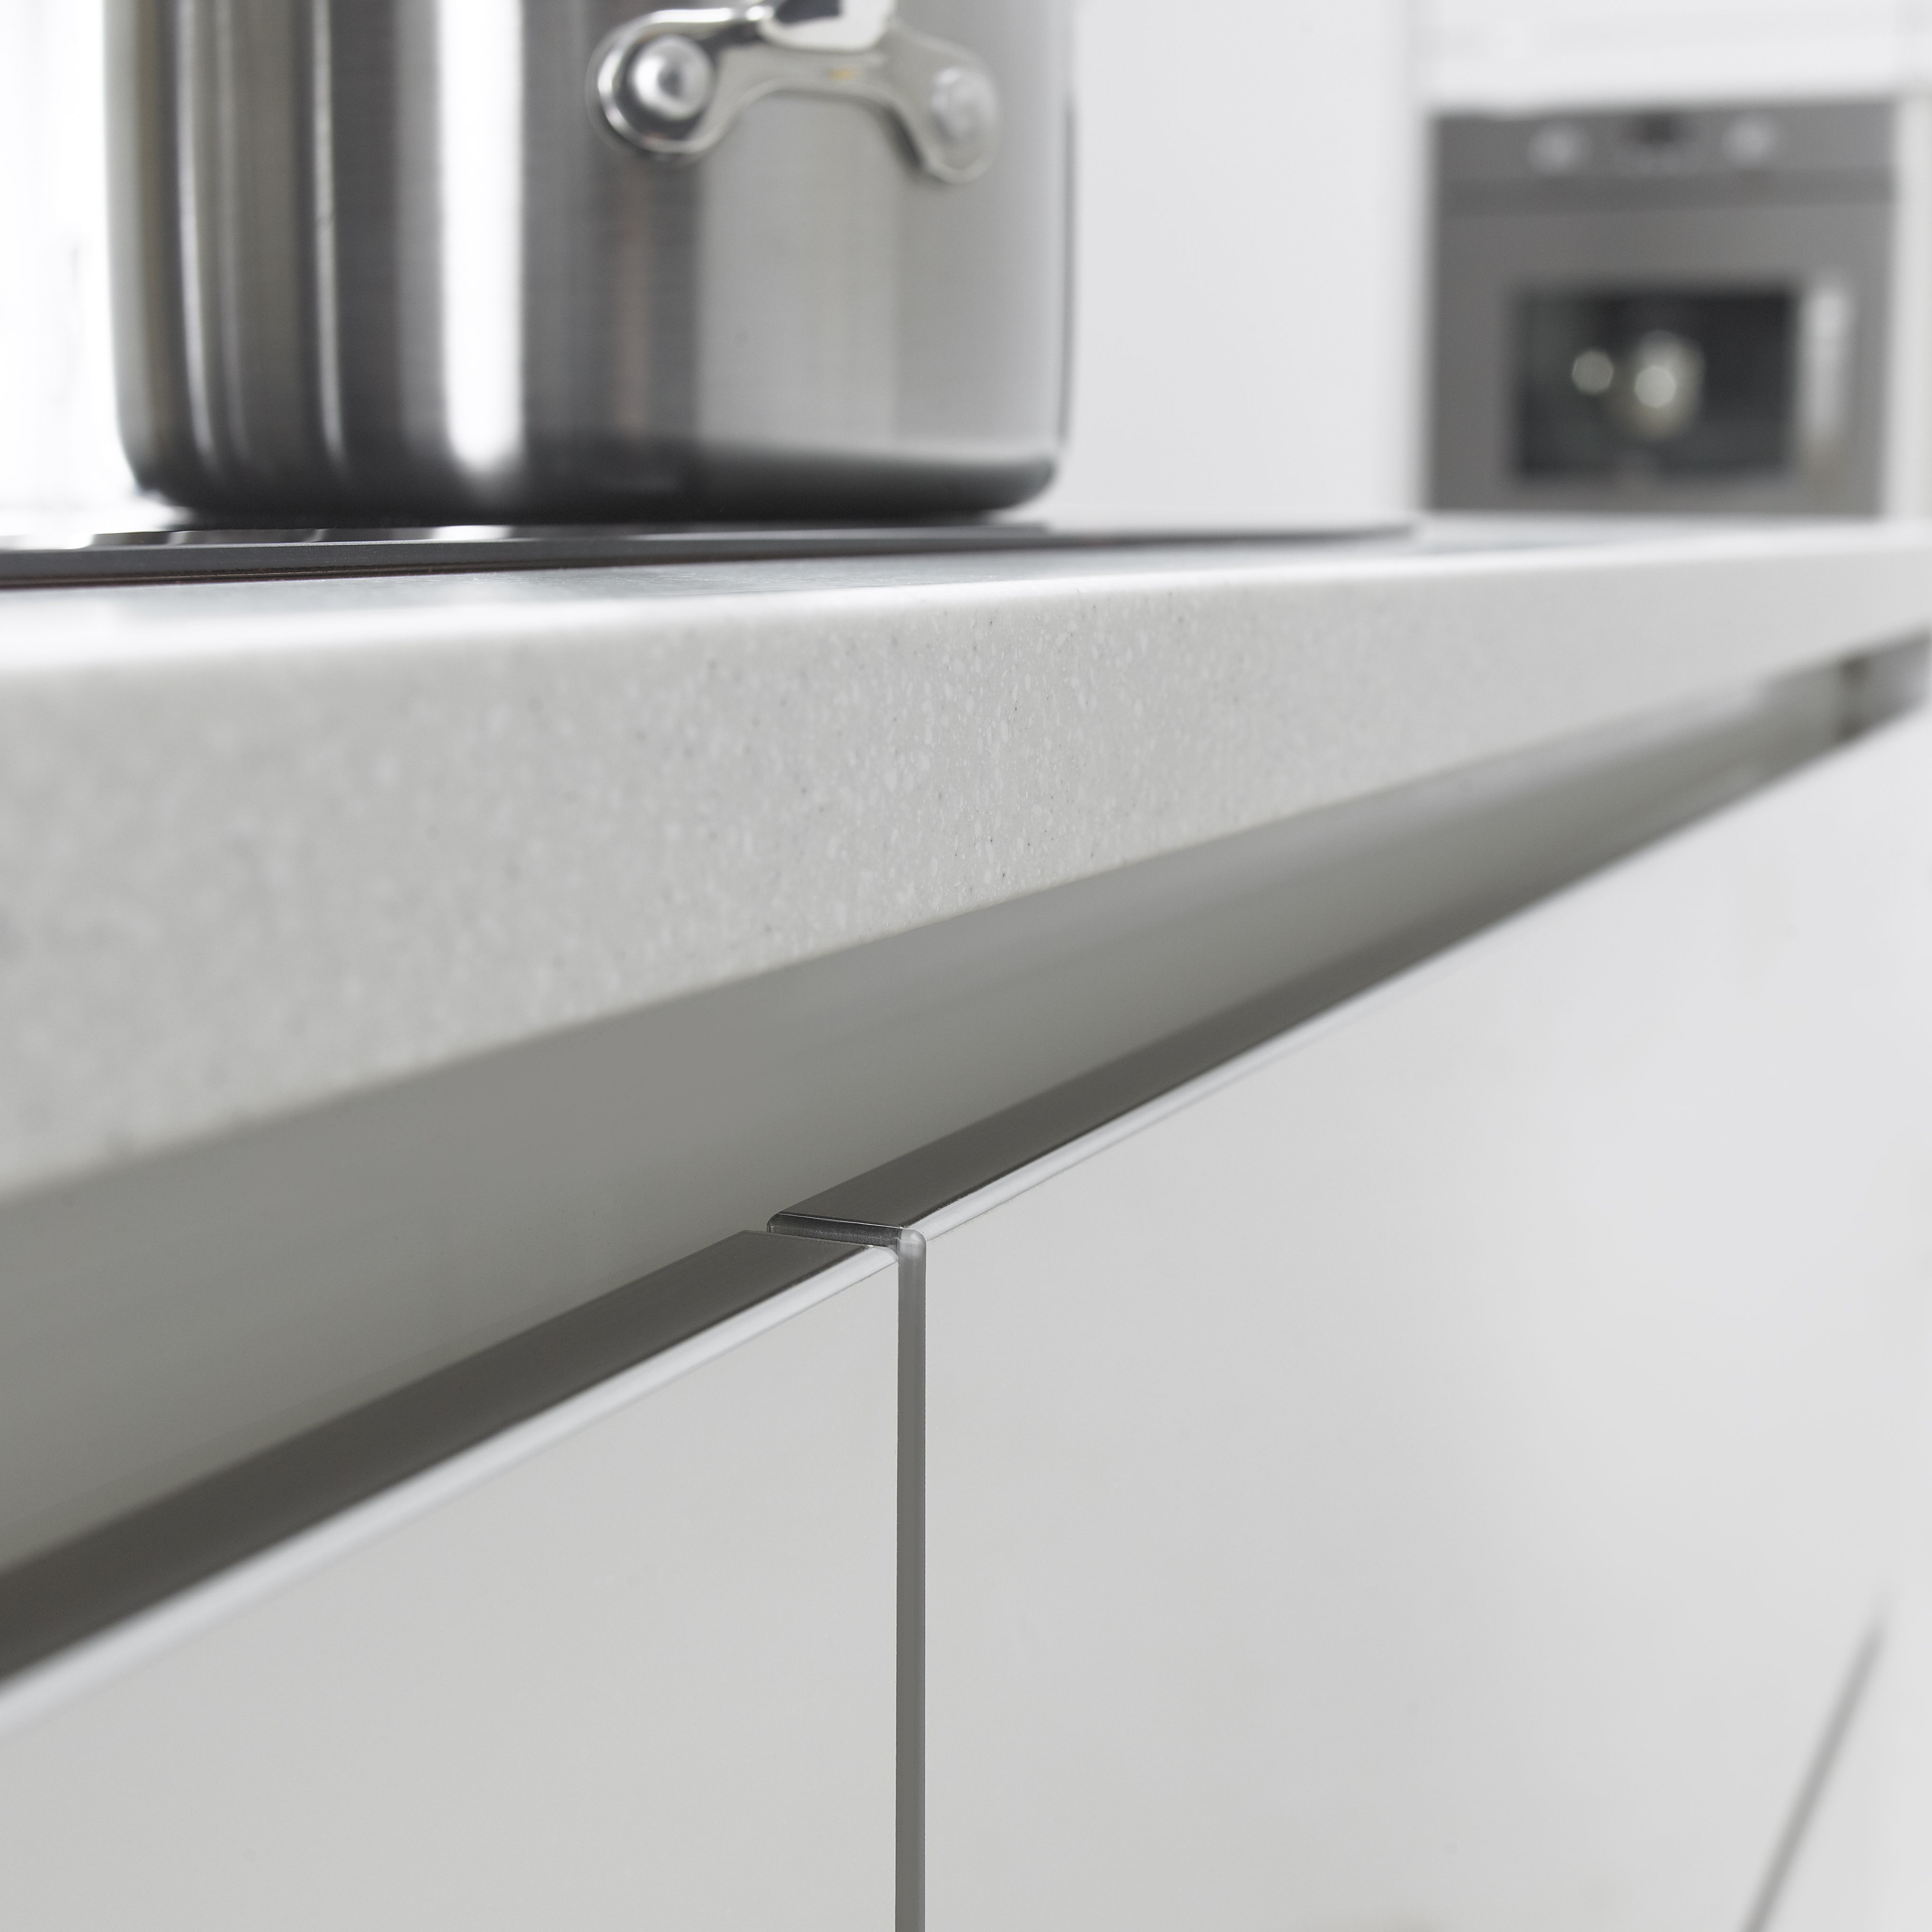 Symphony Kitchen Worktops: A Handleless Kitchen Design That